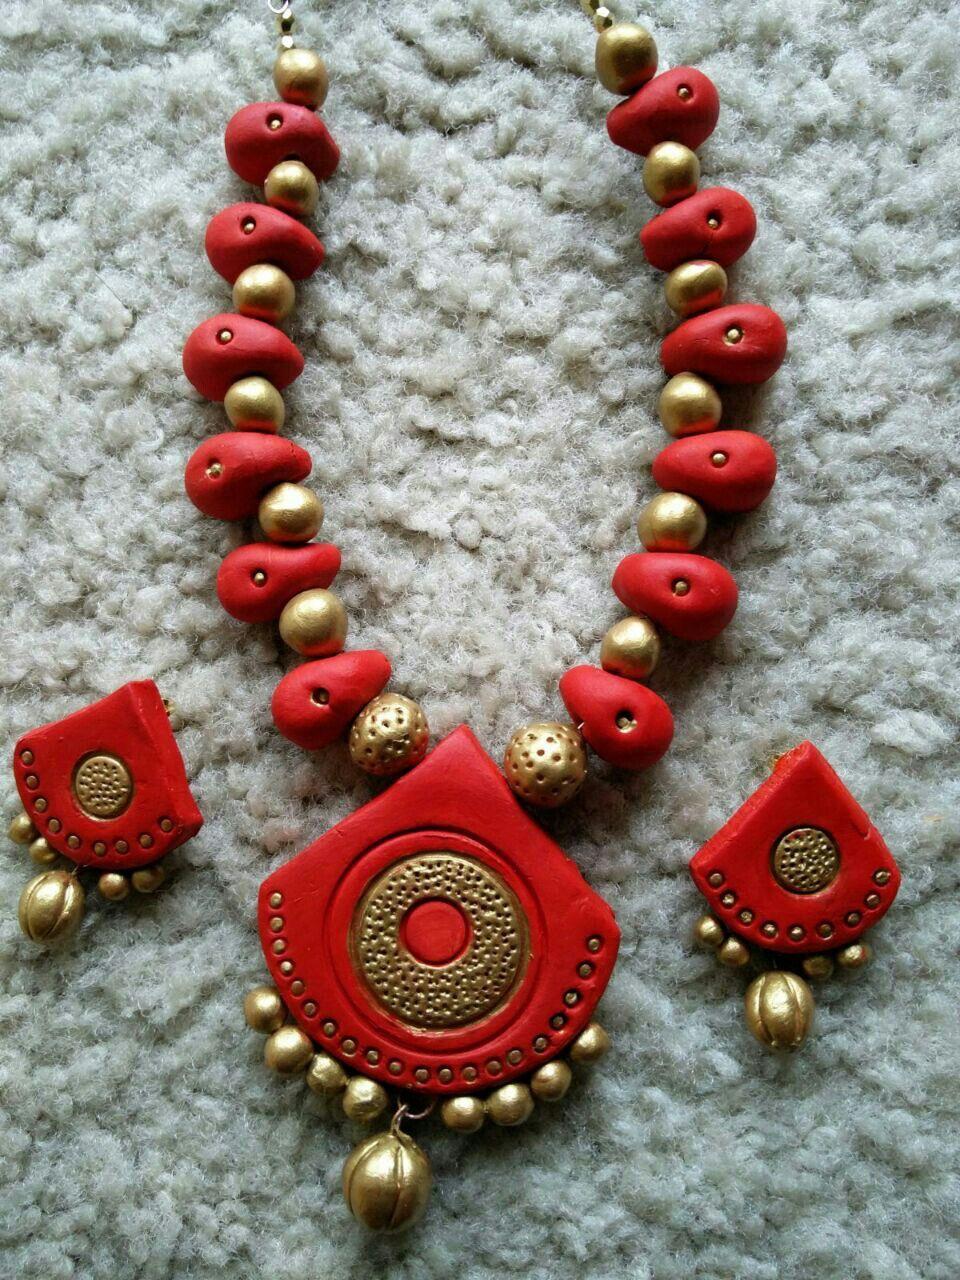 Pin By Dax Bhuvi On Terracotta Terracotta Jewellery Making Terracotta Jewellery Terracota Jewellery